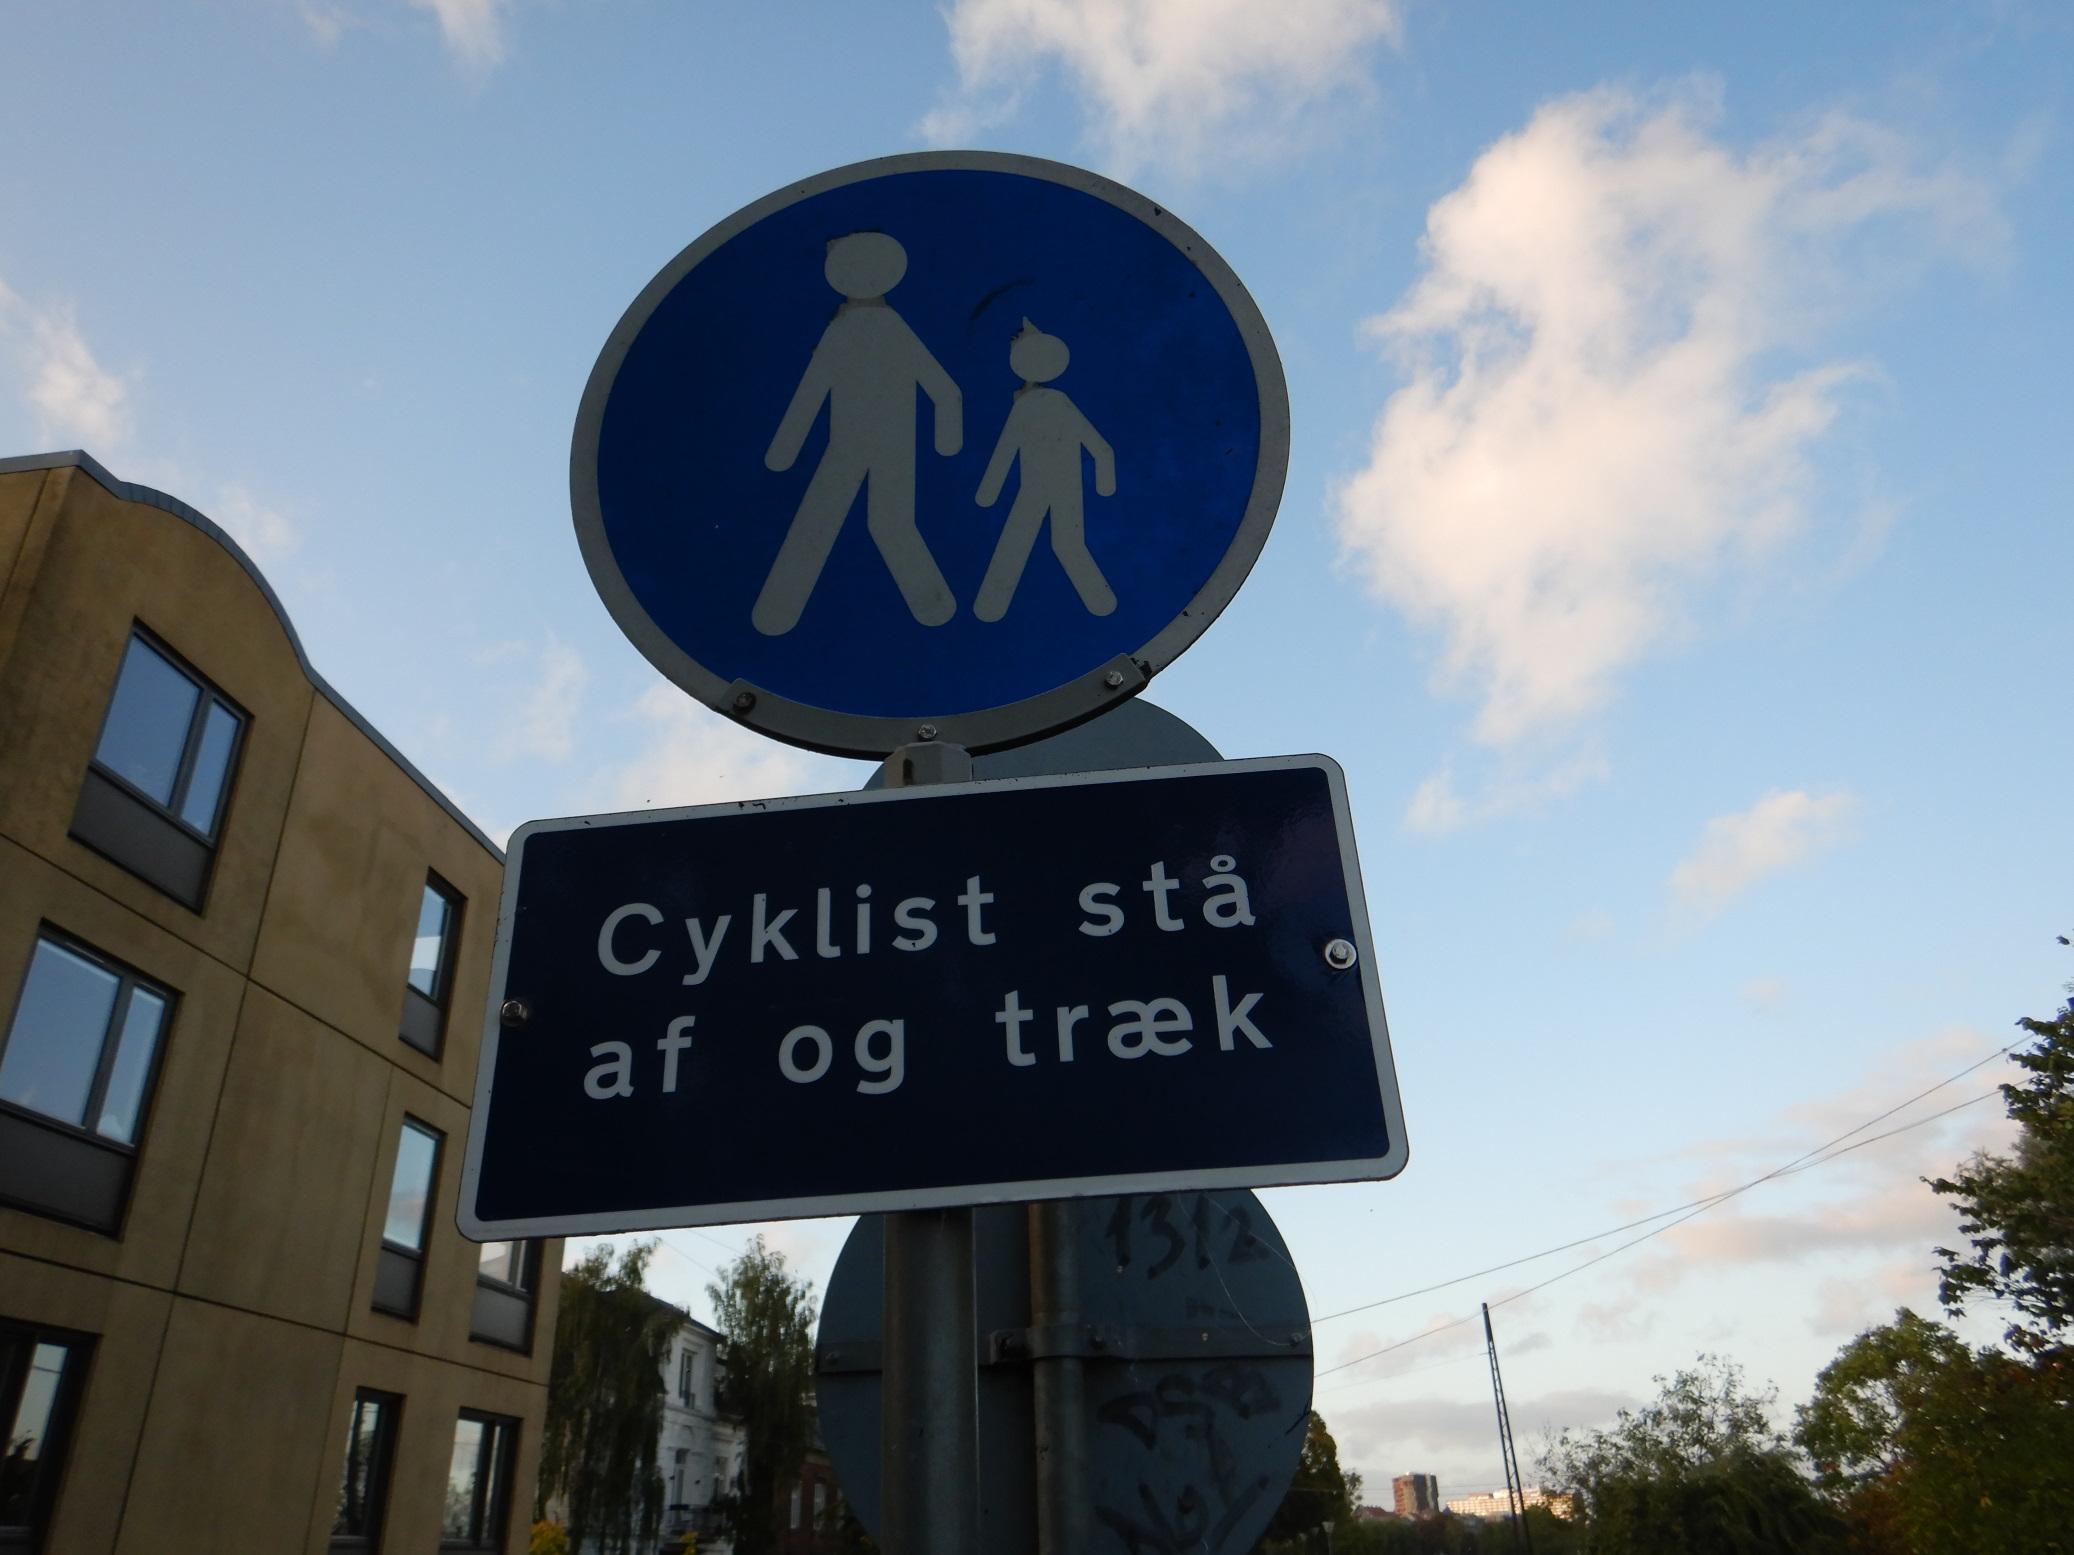 Schilder an Dänemarks Straßen – Cyklist stå af og træk!